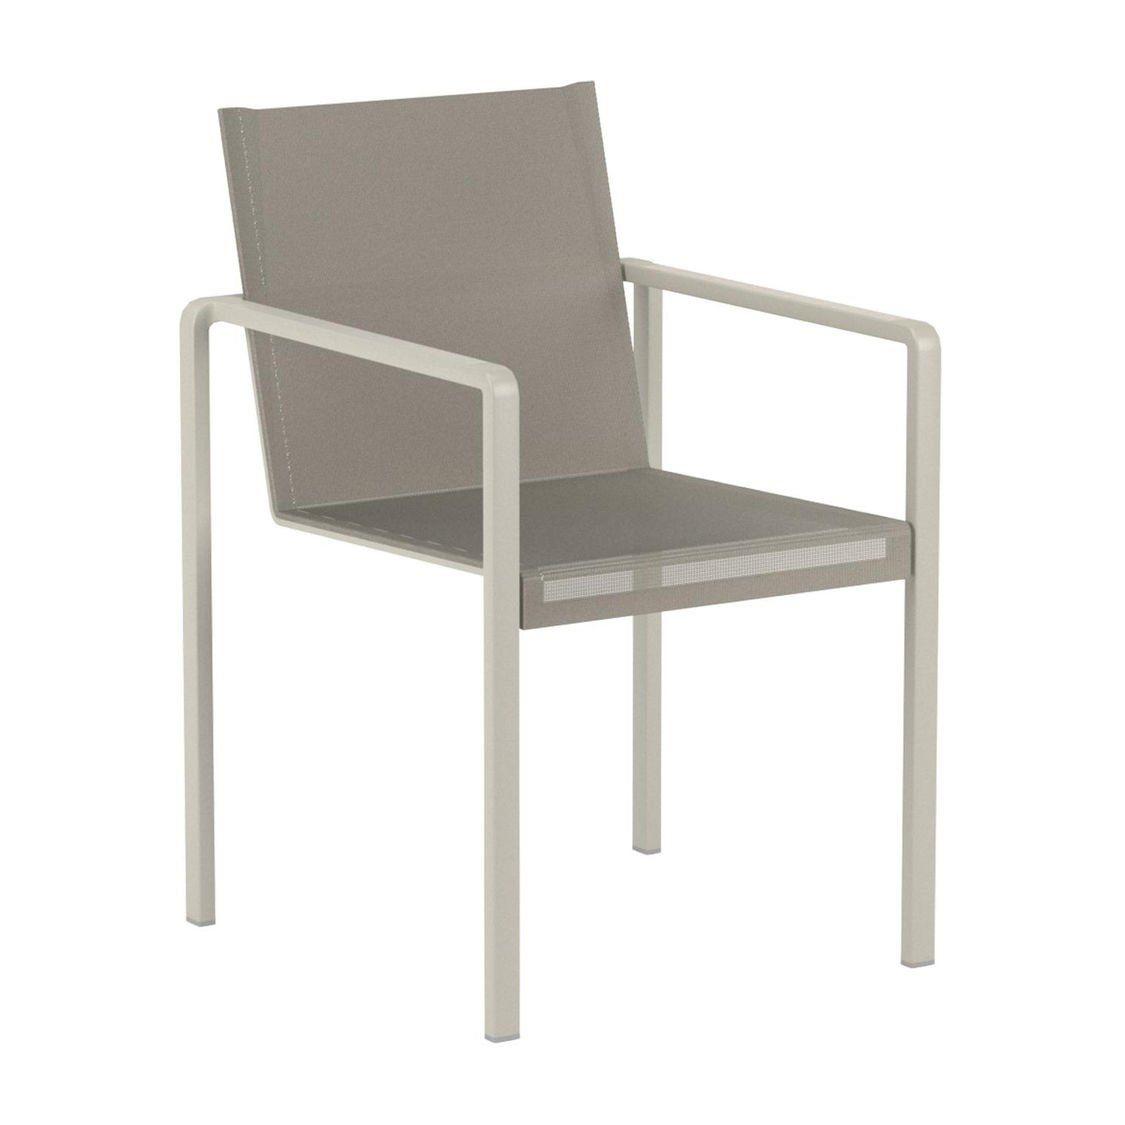 Alura Outdoor Armchair